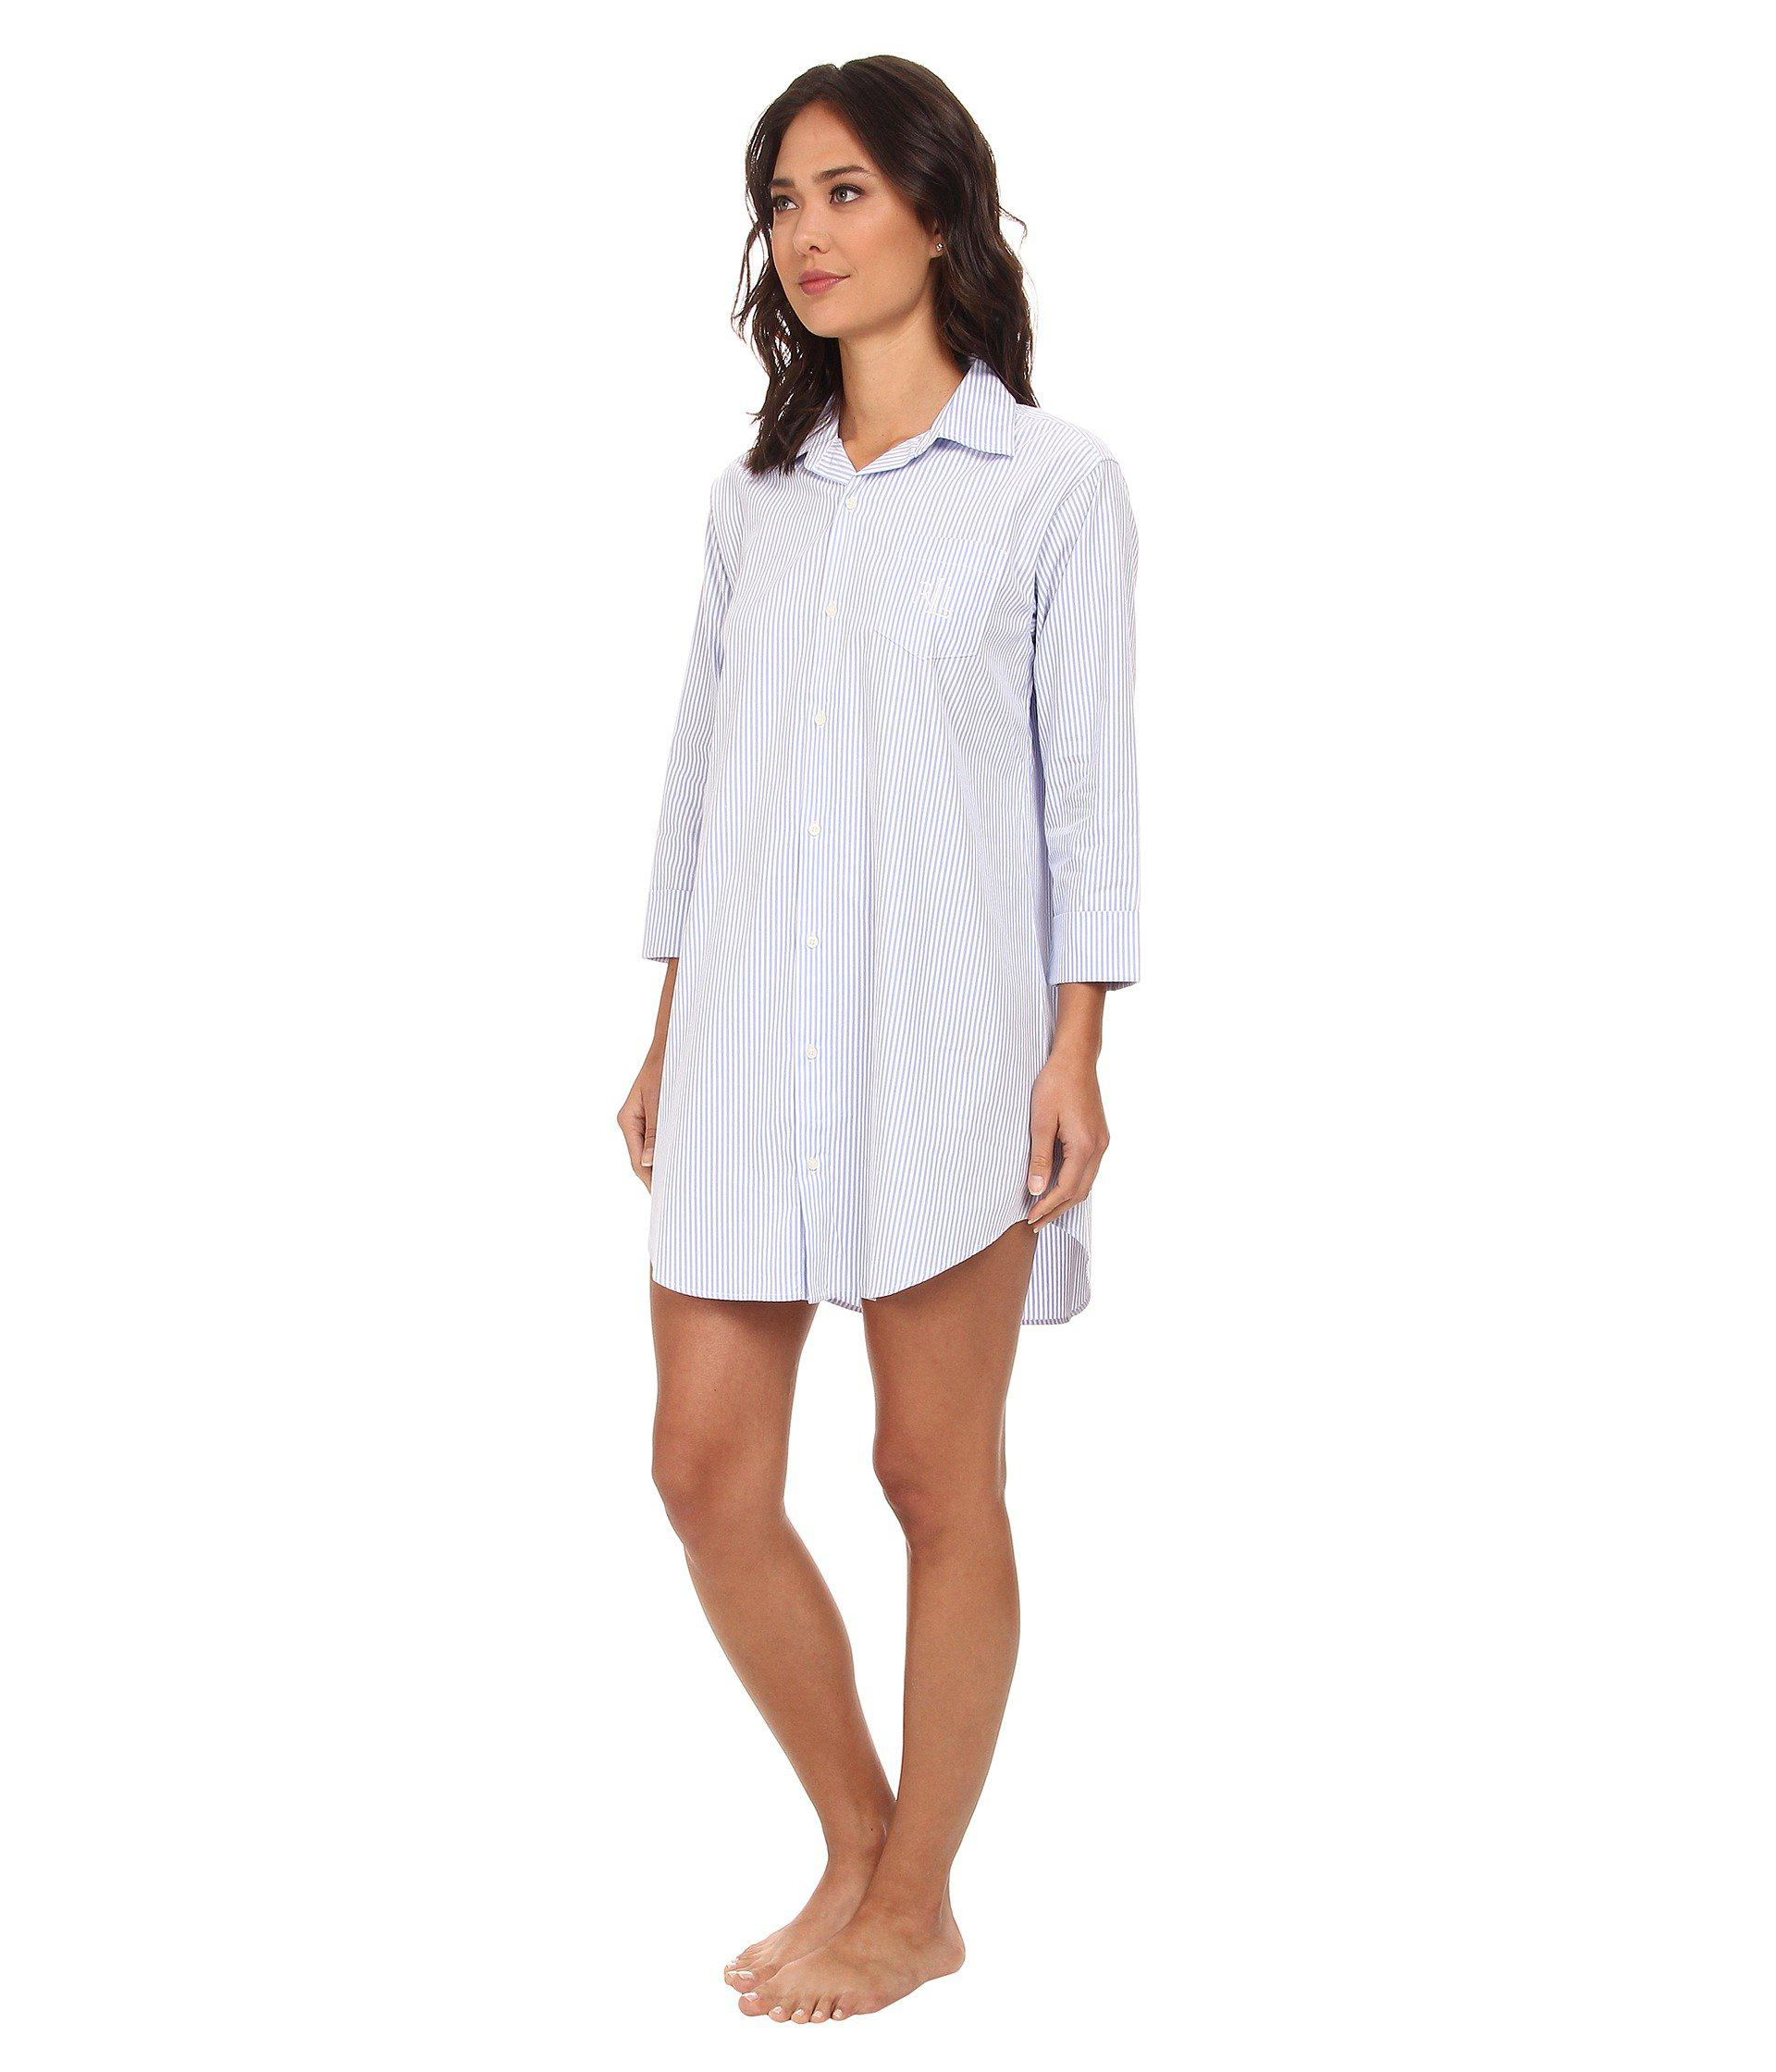 5aeed3bc5f Lyst - Lauren by Ralph Lauren Essentials Striped His Shirt (carissa Bengal  Stripe Pink Hyacinth white) Women s Pajama in Blue